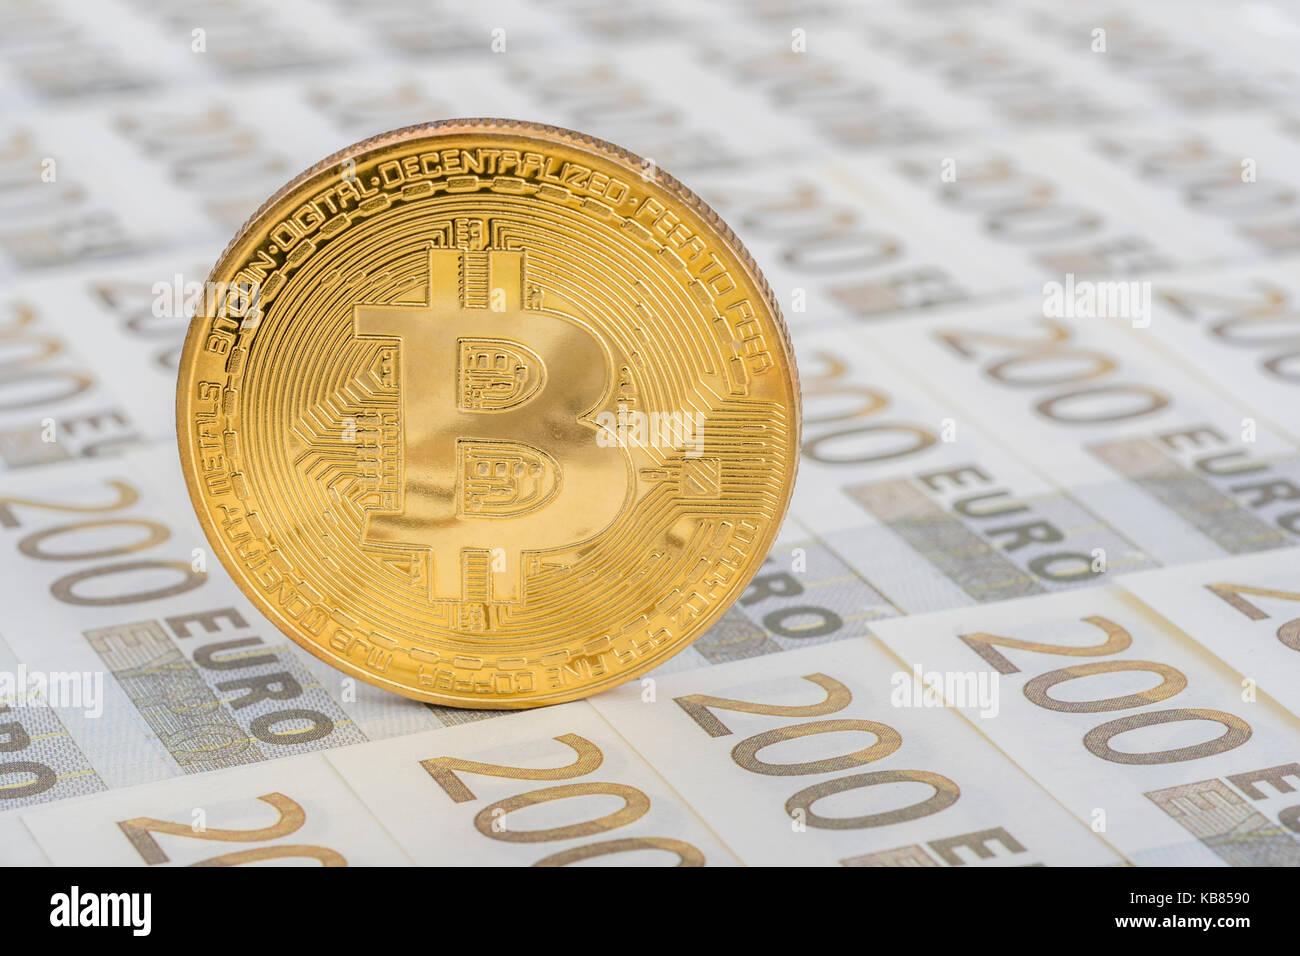 Gold Bitcoin on 200 Euro banknote - as metaphor for European Digital Single Market, Bitcoin-Euro exchange rate, - Stock Image